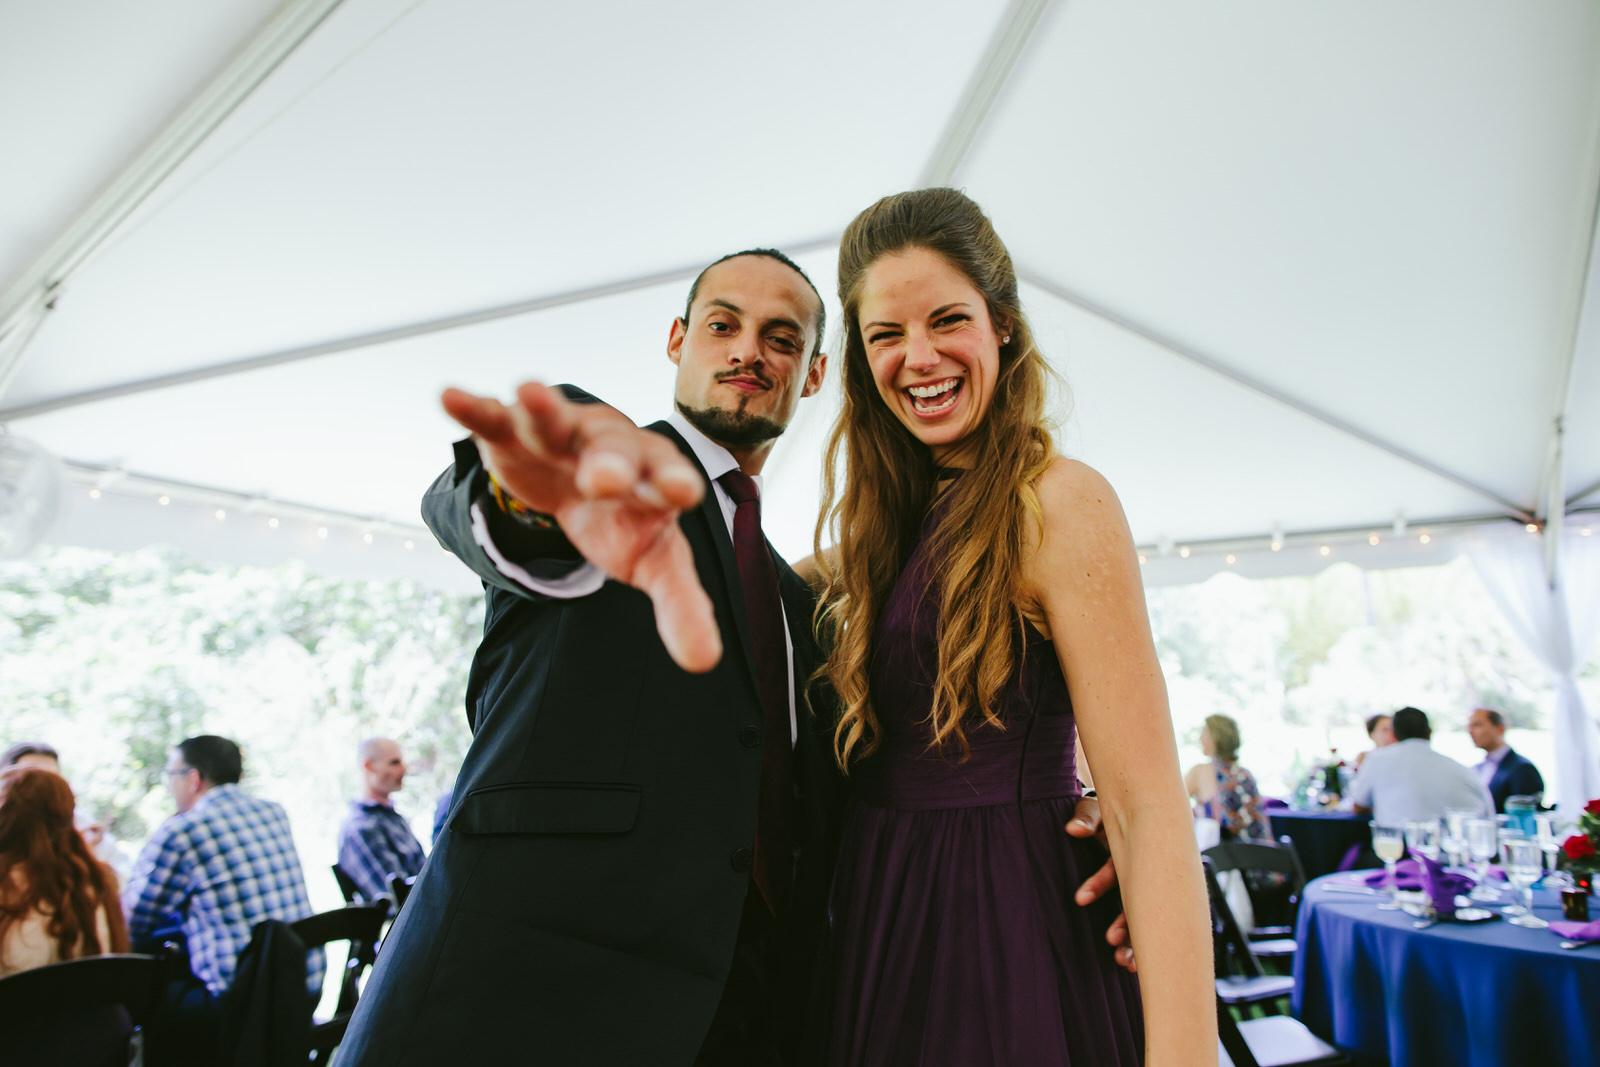 kashi-wedding-reception-tiny-house-photo-fun-candids-wedding-guests.jpg